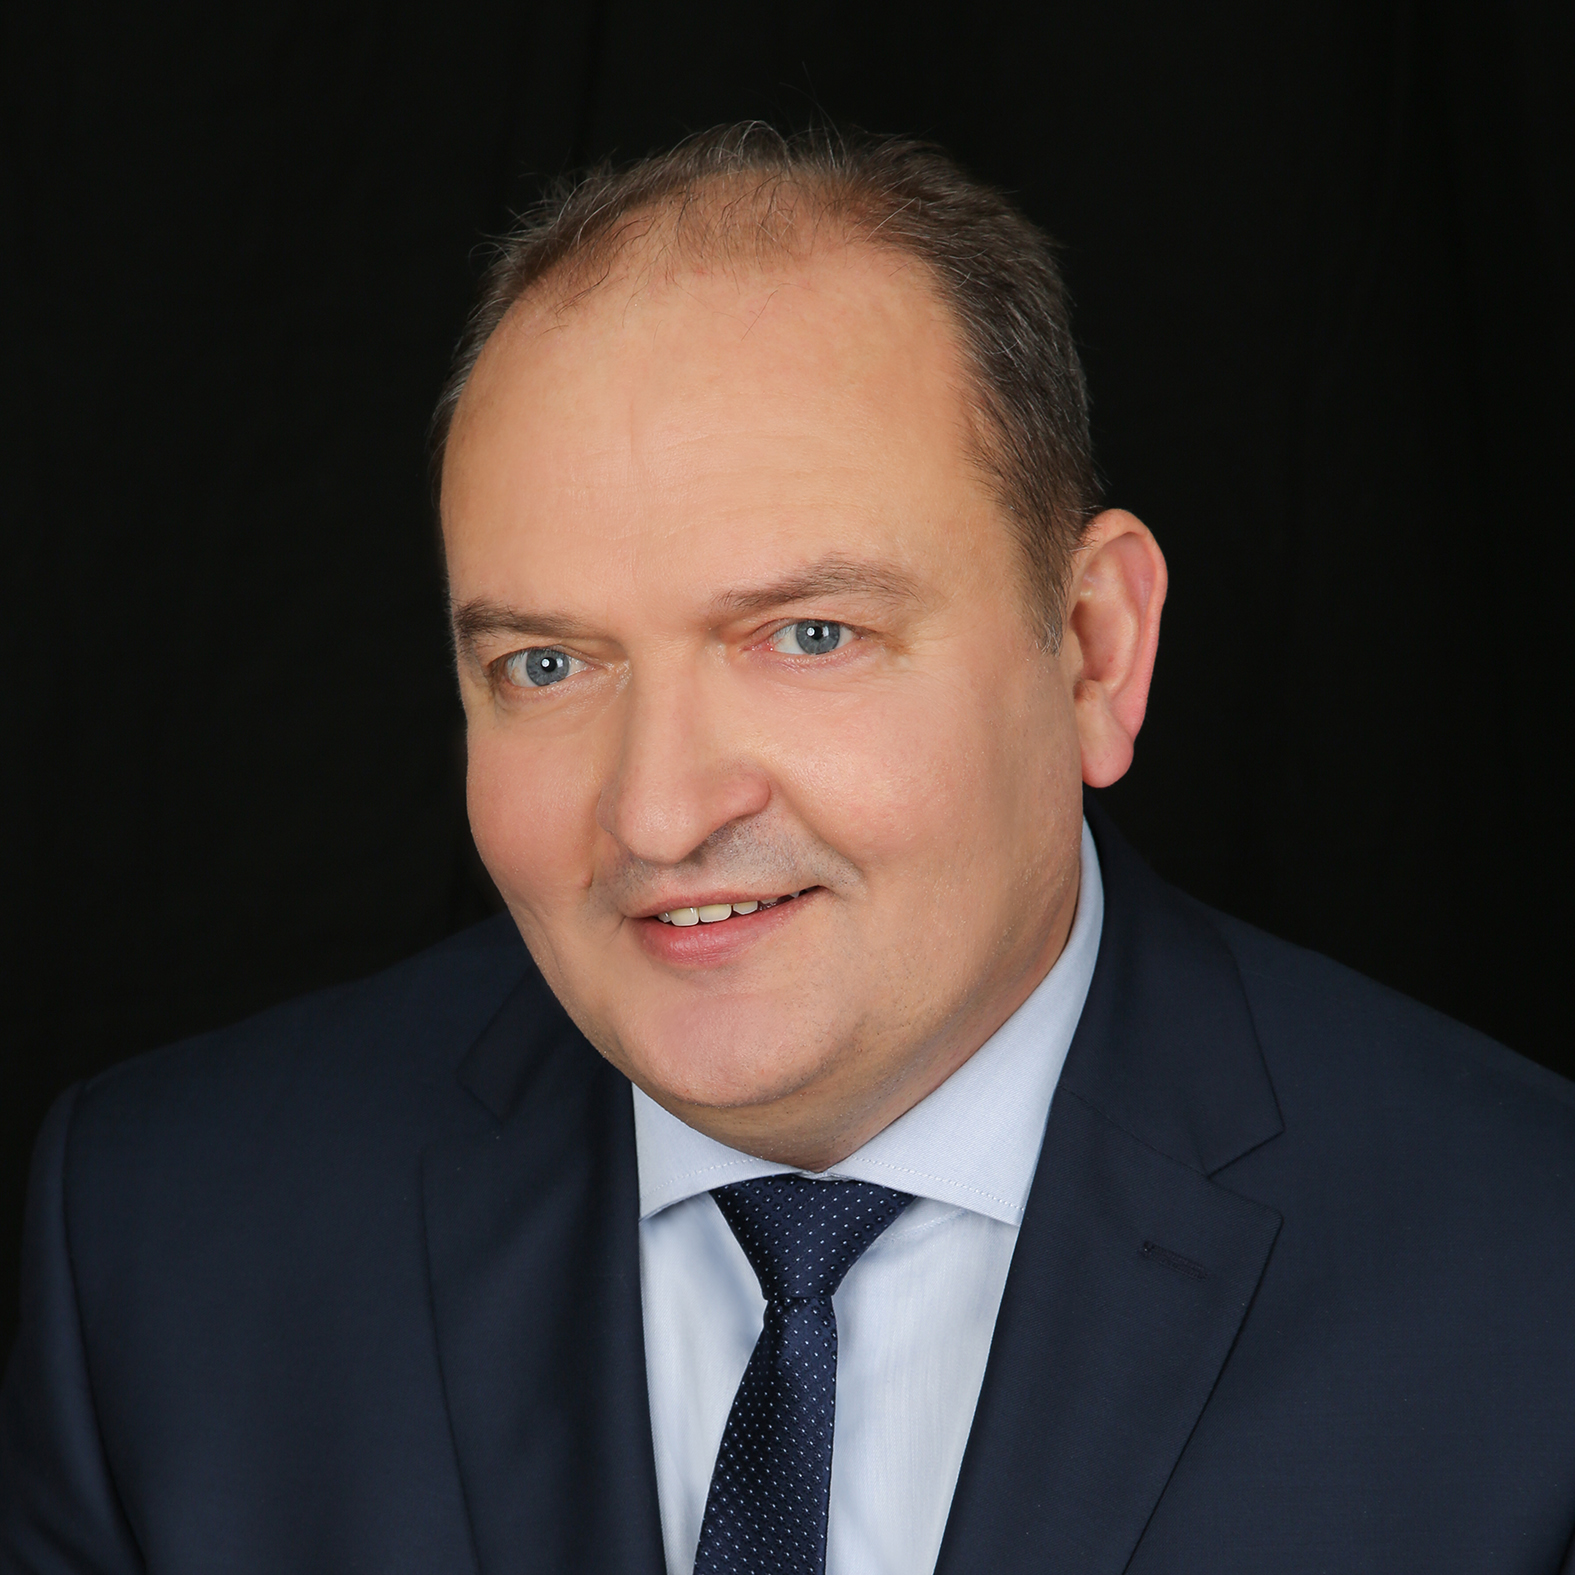 Robert Małetka